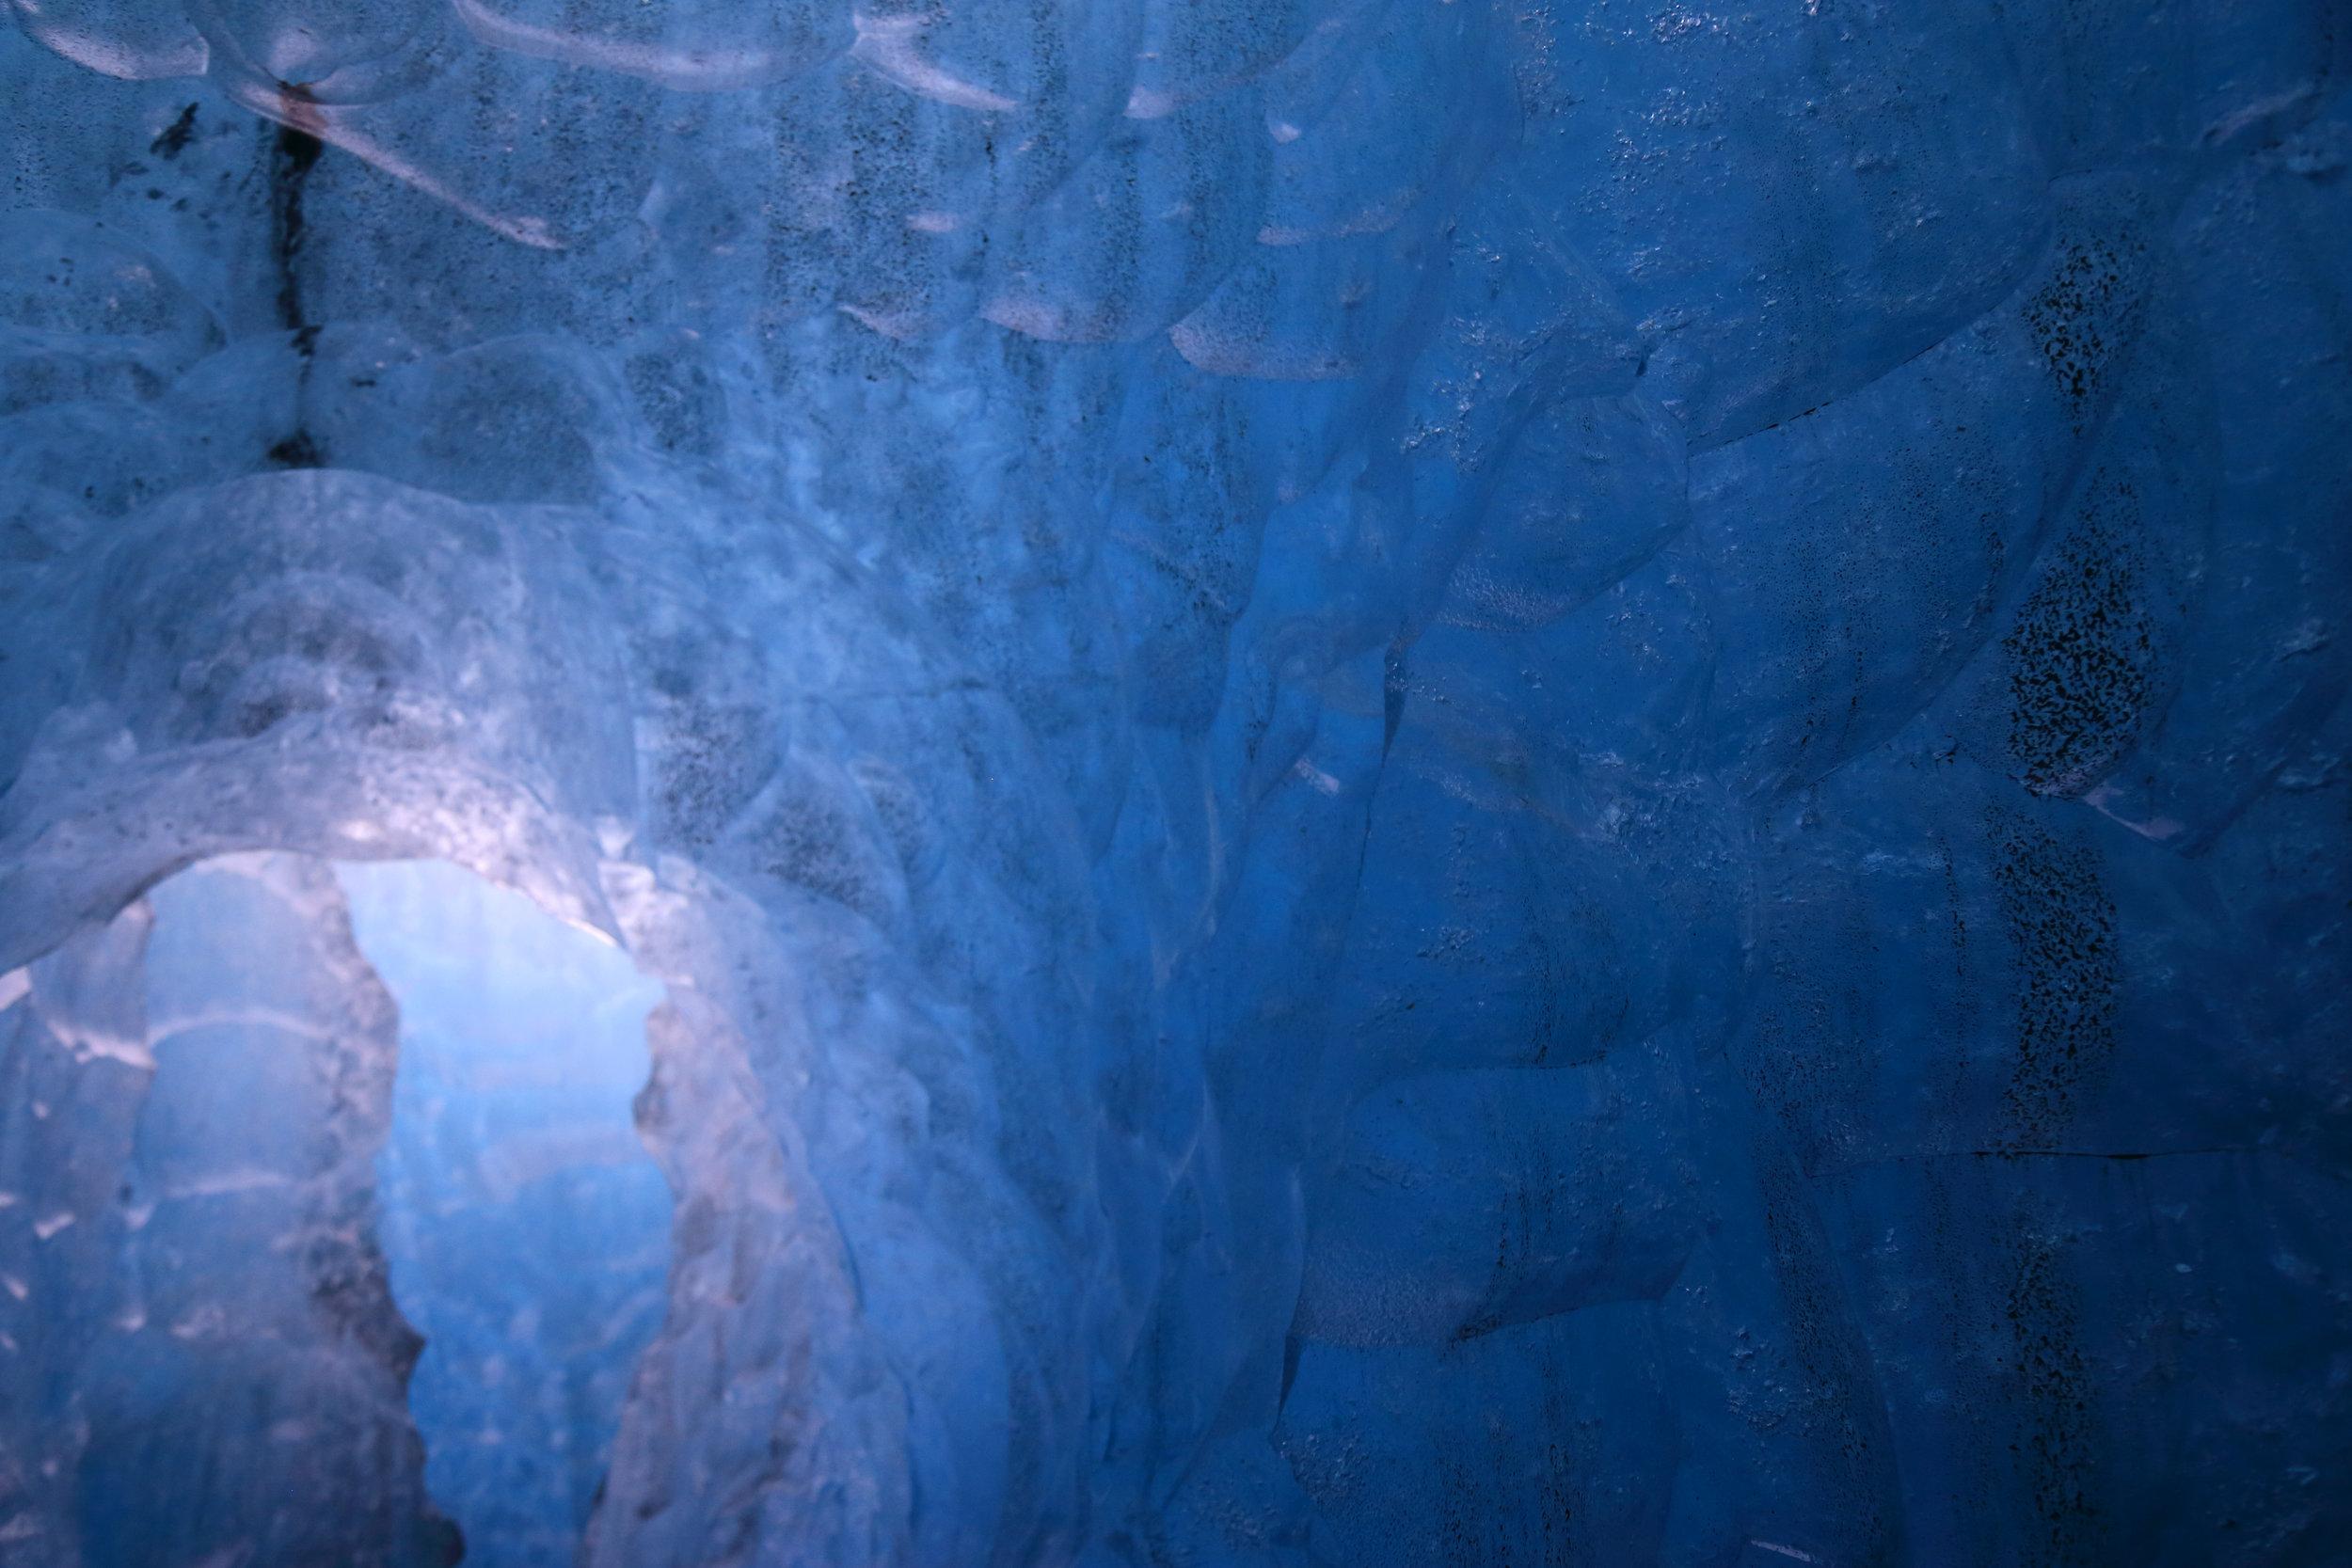 Icy blue hues